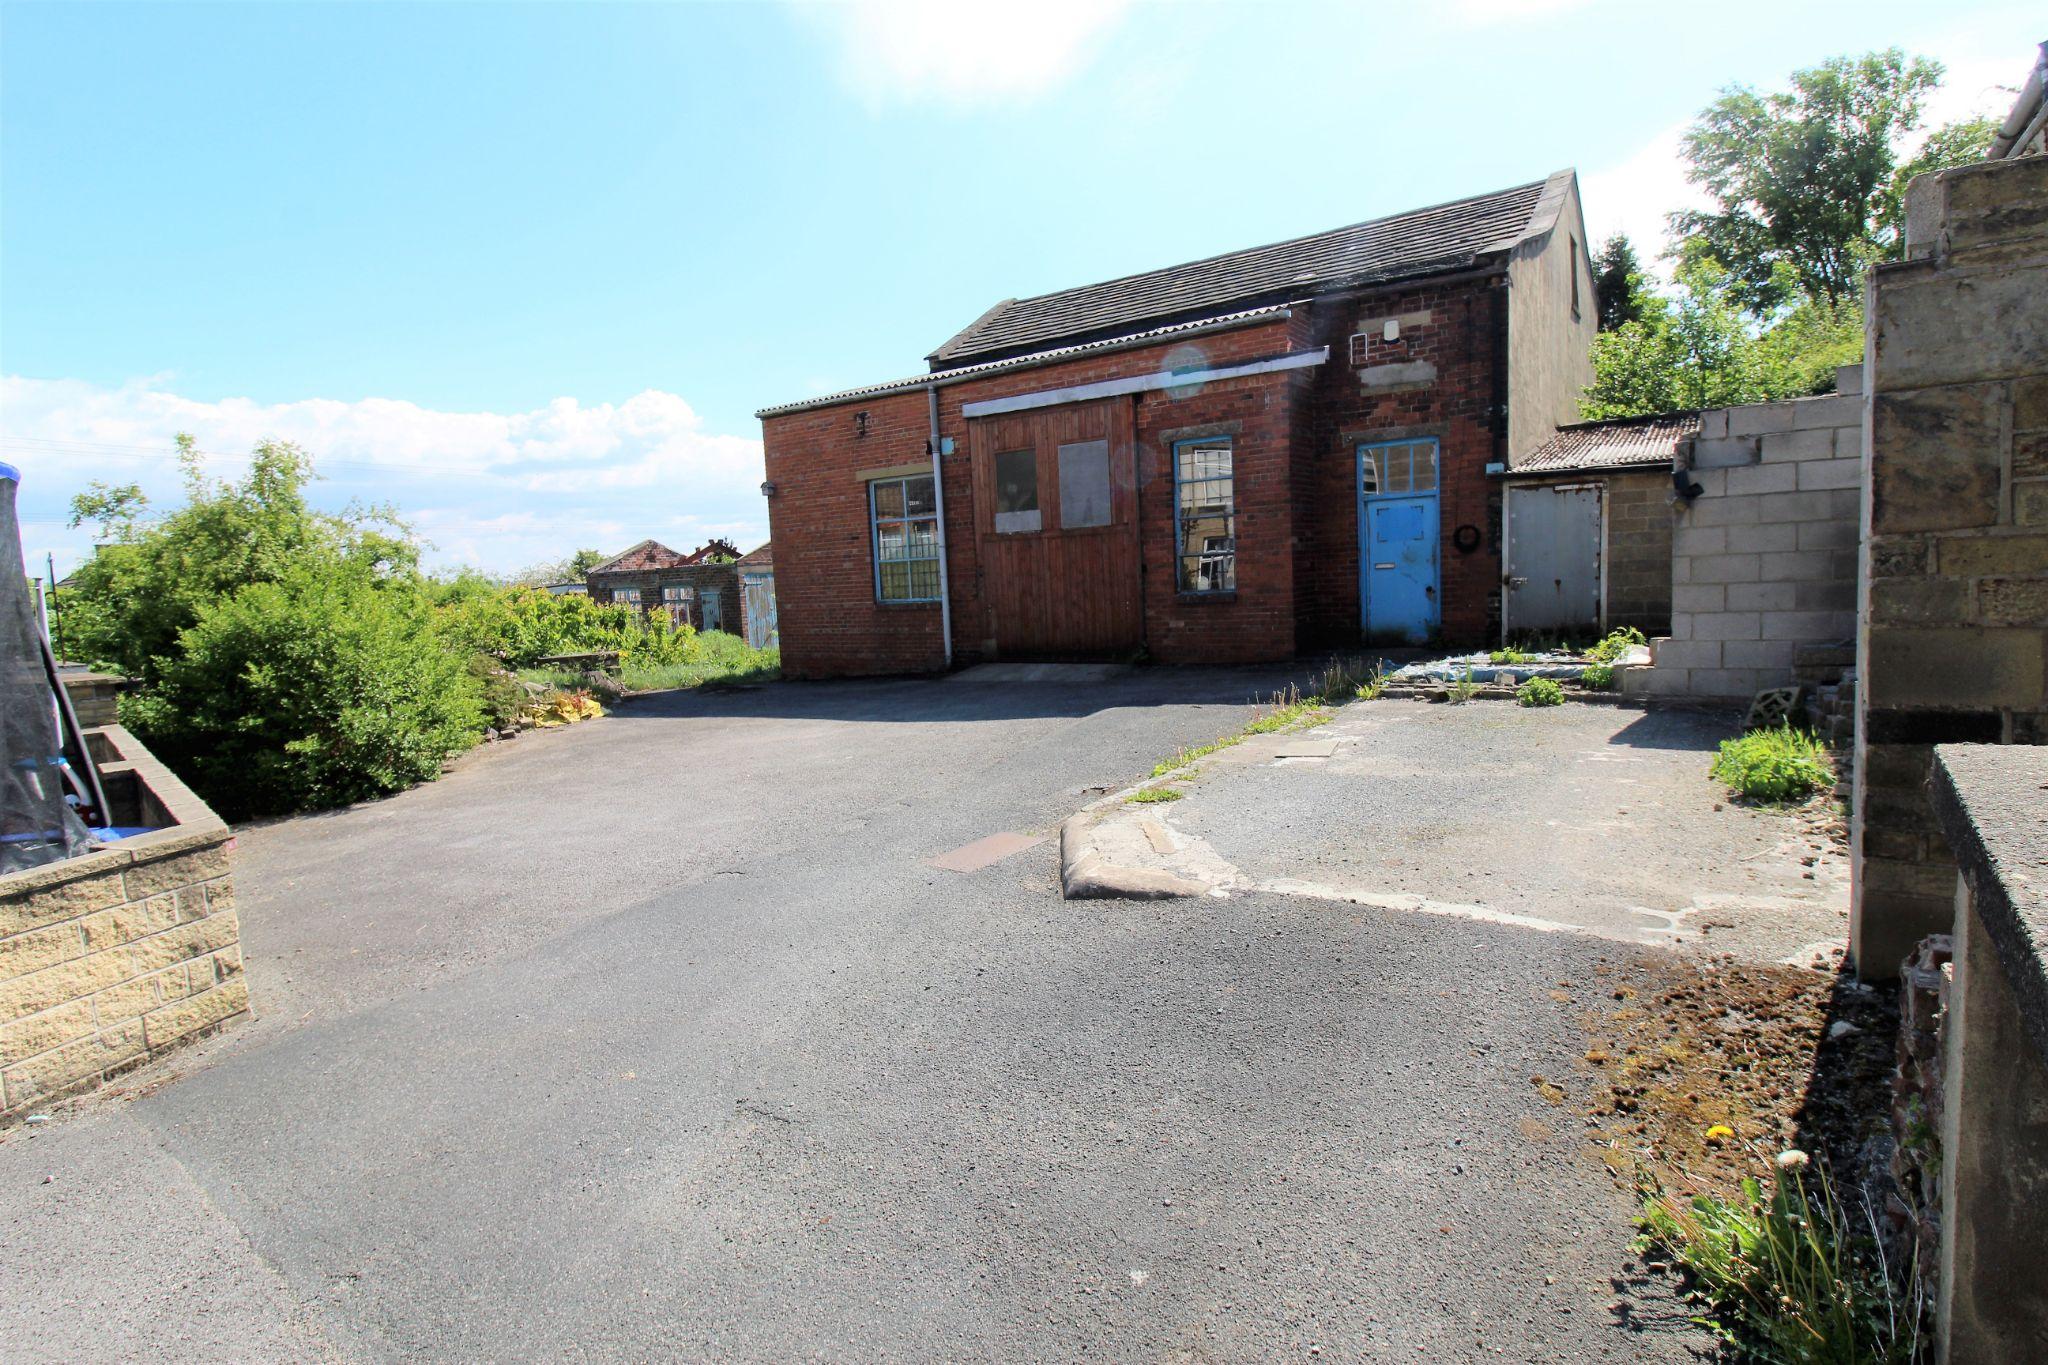 Plot Land SSTC in Bradford - Photograph 1